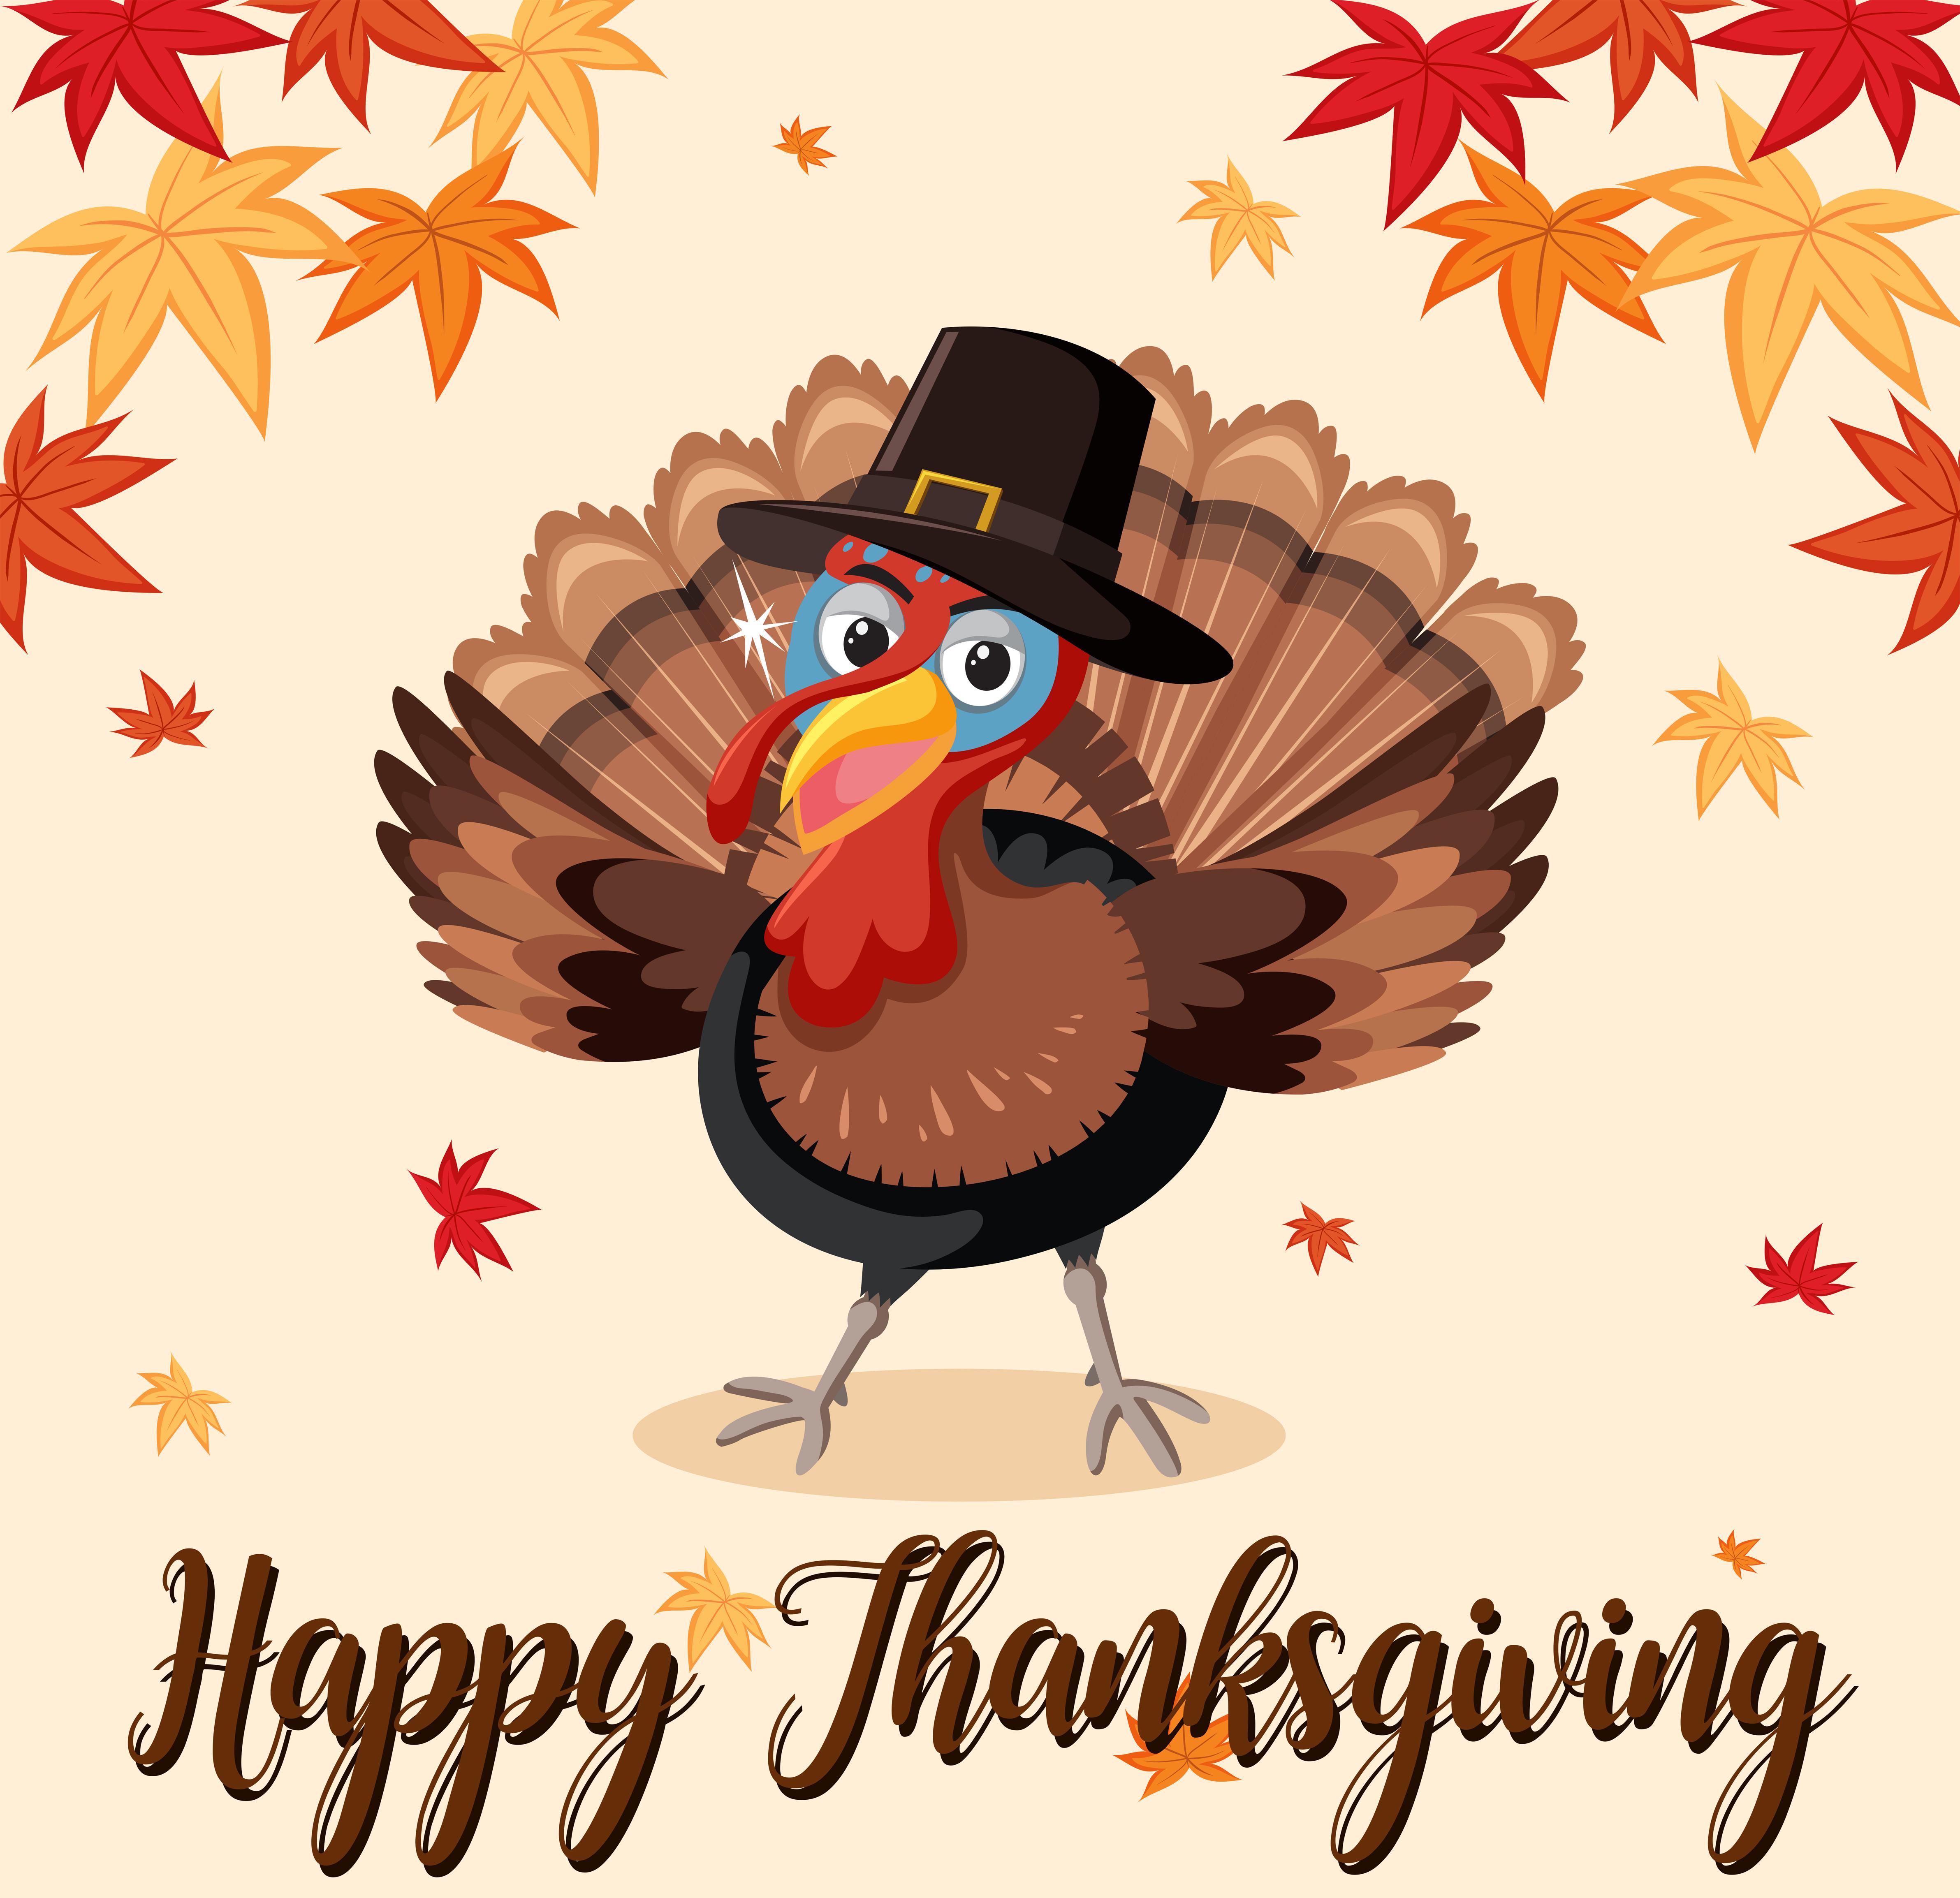 Happy Thanksgiving Truthahn Vorlage 303496 Vektor Kunst Bei Vecteezy